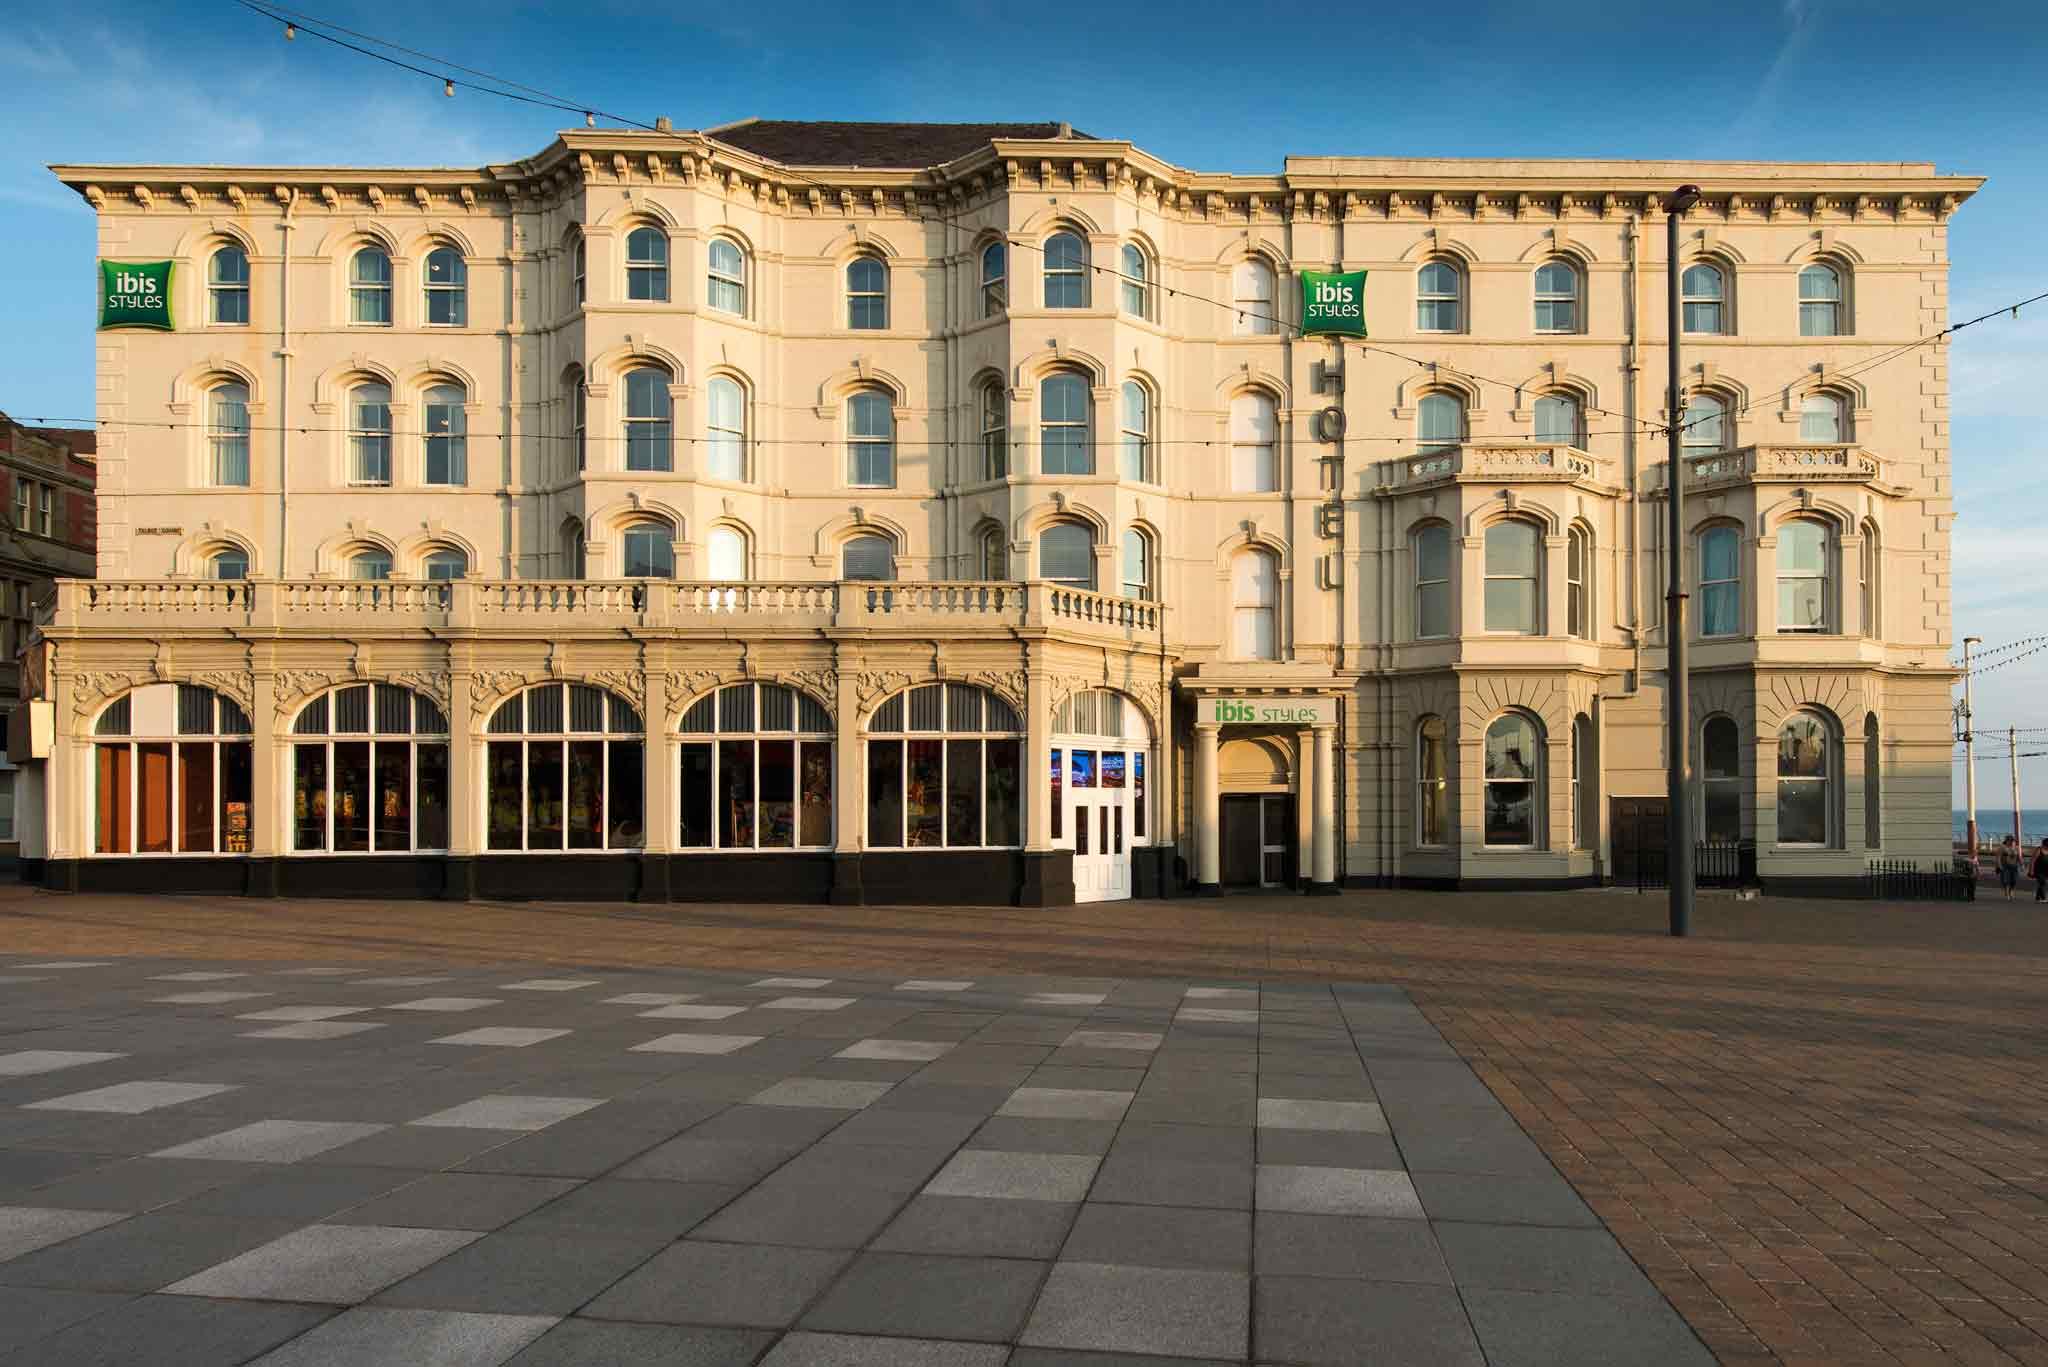 Hotel – ibis Styles Blackpool